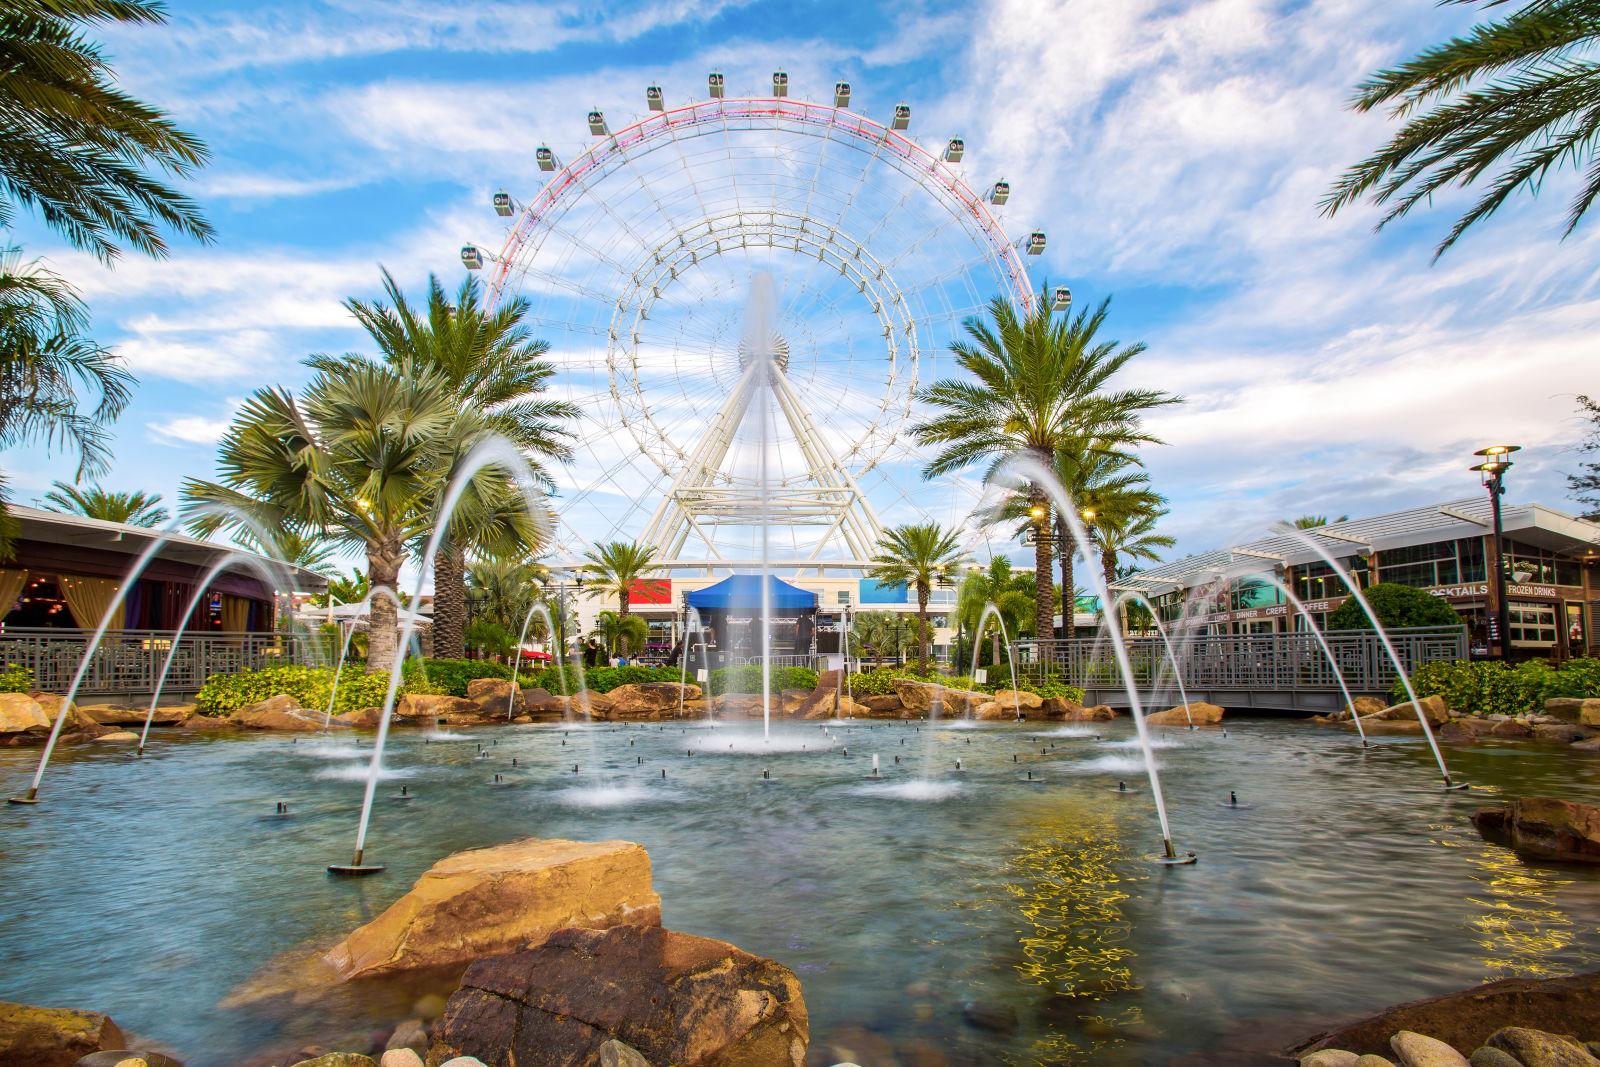 Amusement Park, Ferris Wheel, Florida